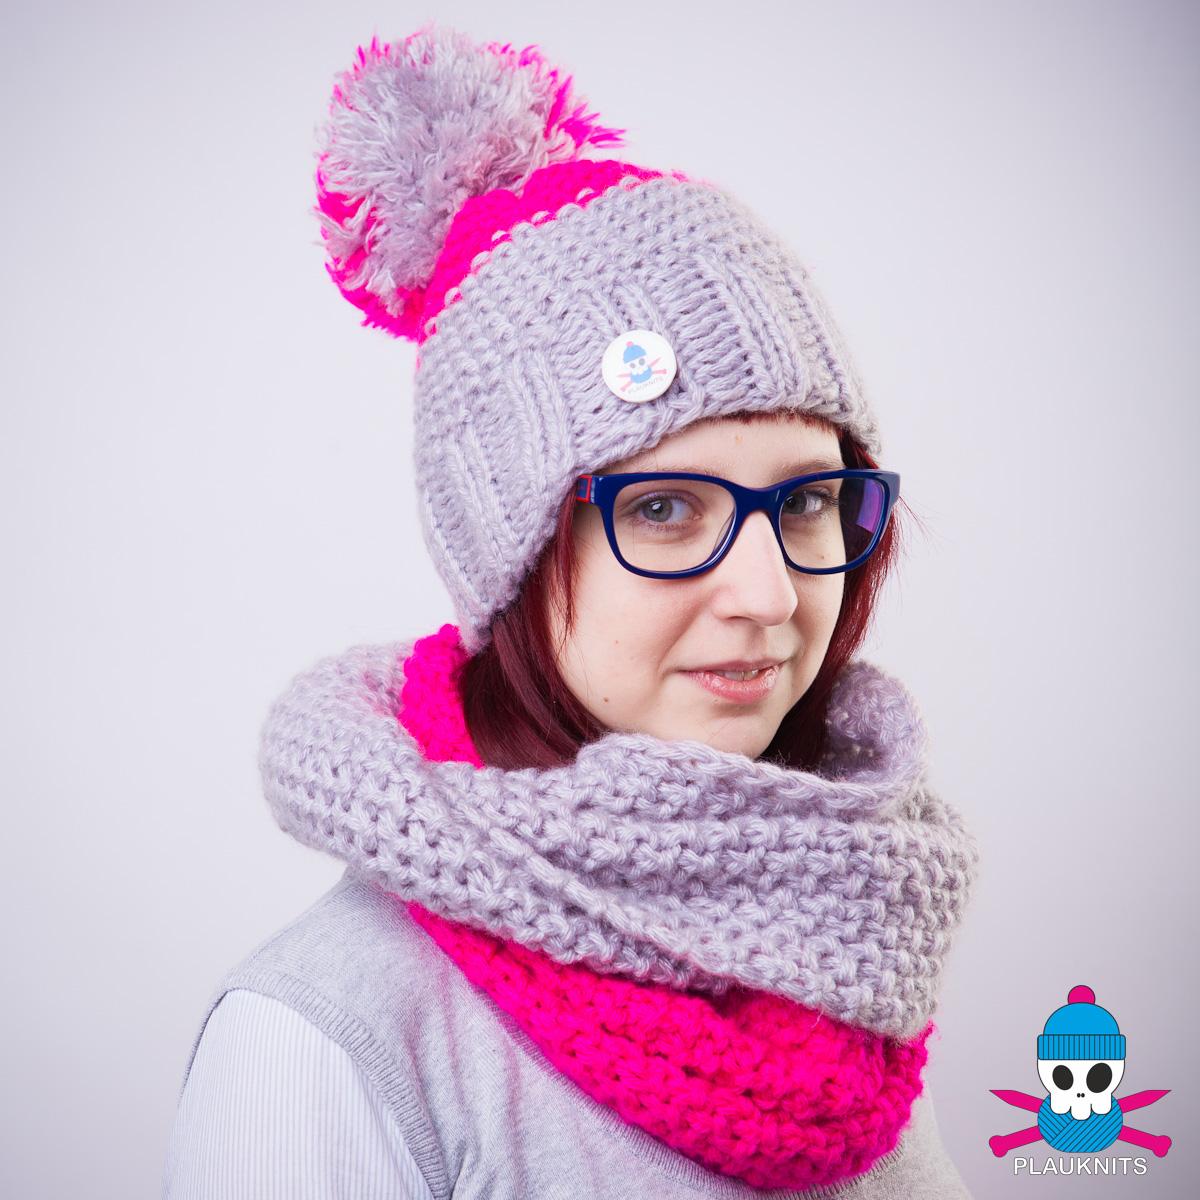 Серо-малиновый вязаный комплект шарф снуд и шапка PLAUKNITS